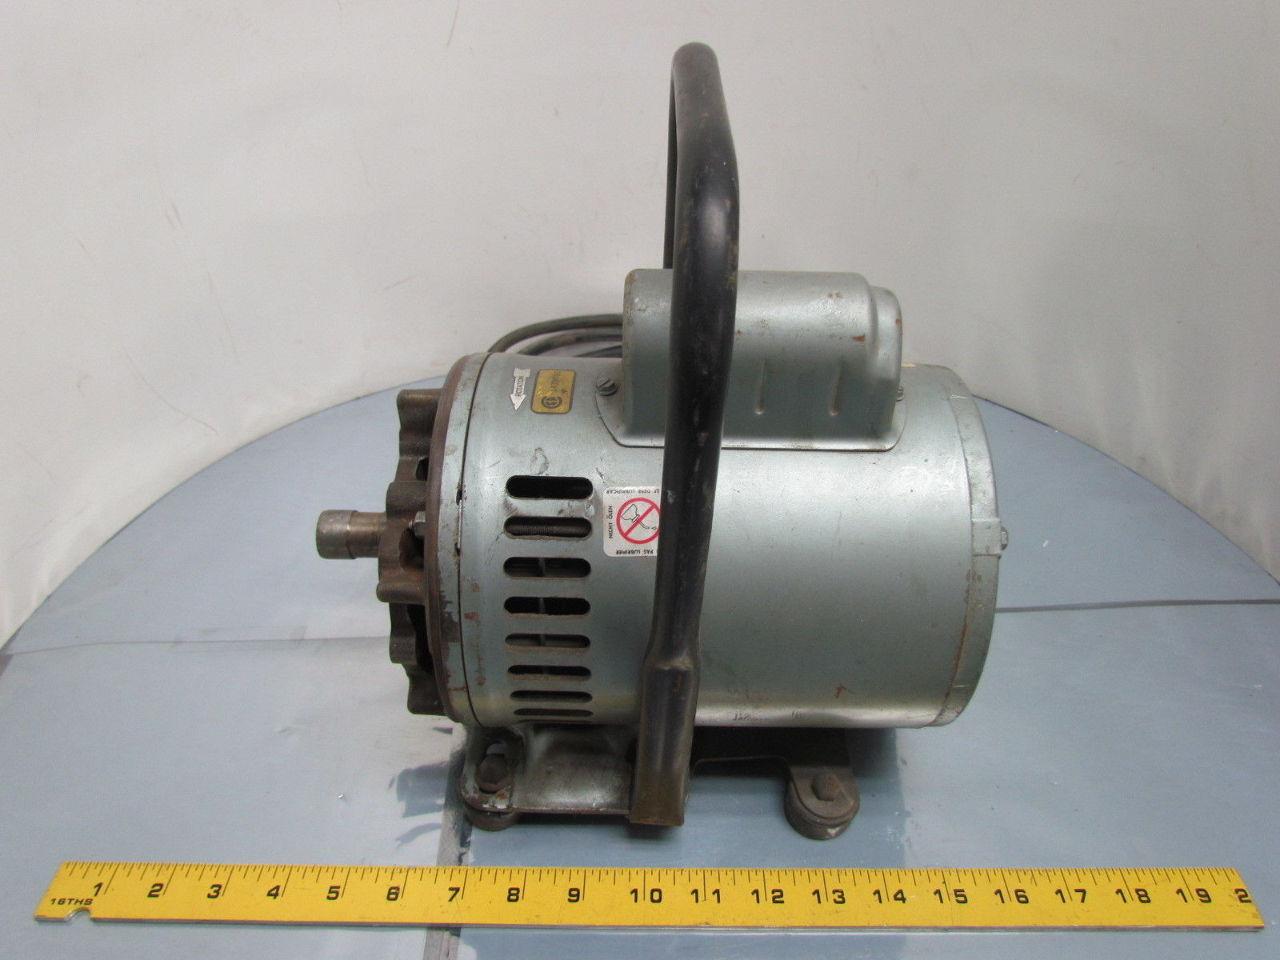 Doerr Emerson Electric Motor Parts Craftsman 358 794742 Wiring Diagram Lr39793 1 2hp 1ph 115 208 230 J56z Vacuum Pump